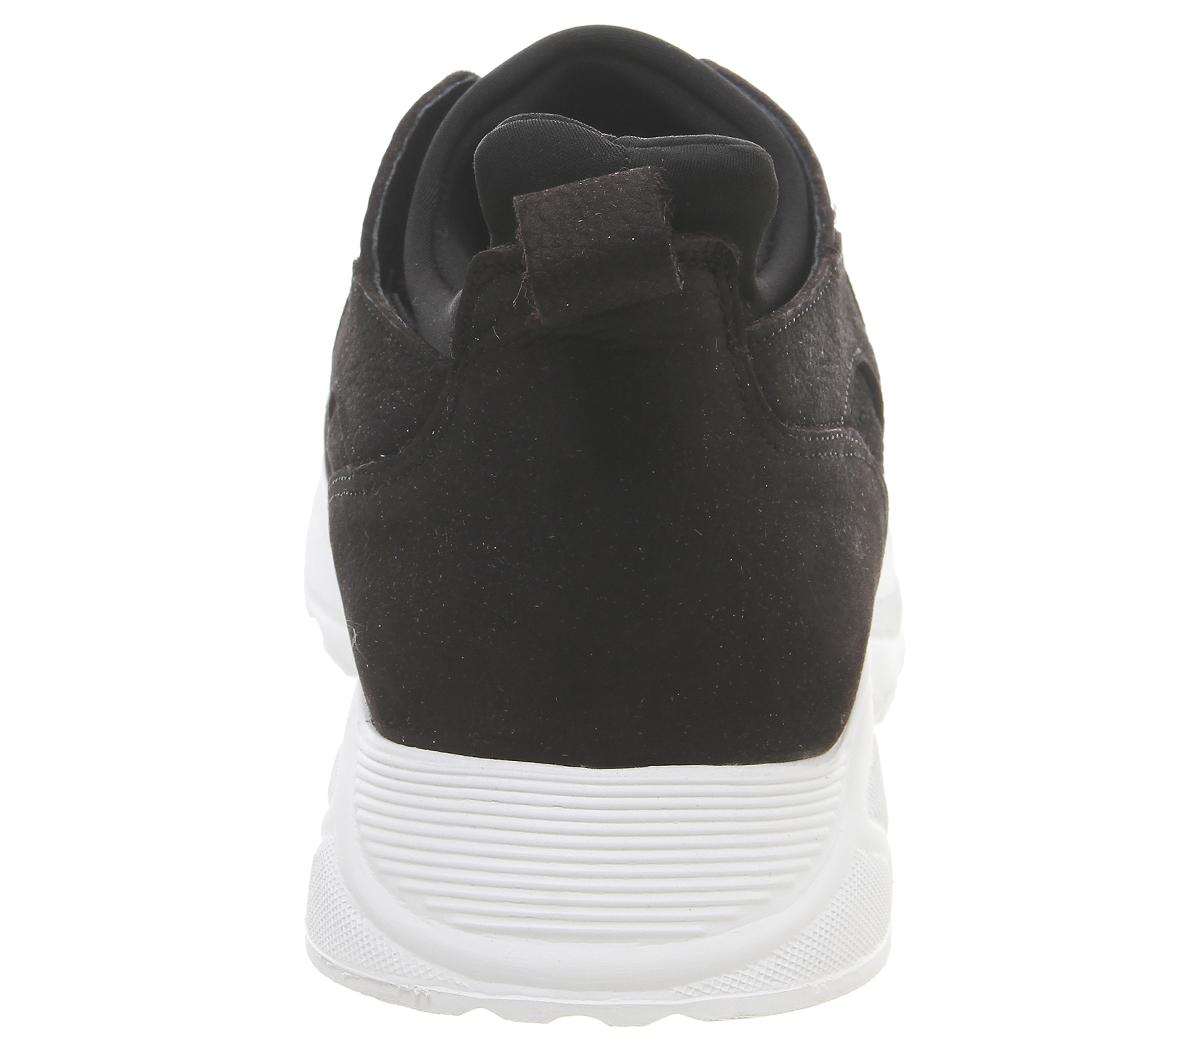 Mens-Office-Lacrosse-Trainers-Black-Nubuck-Casual-Shoes thumbnail 7